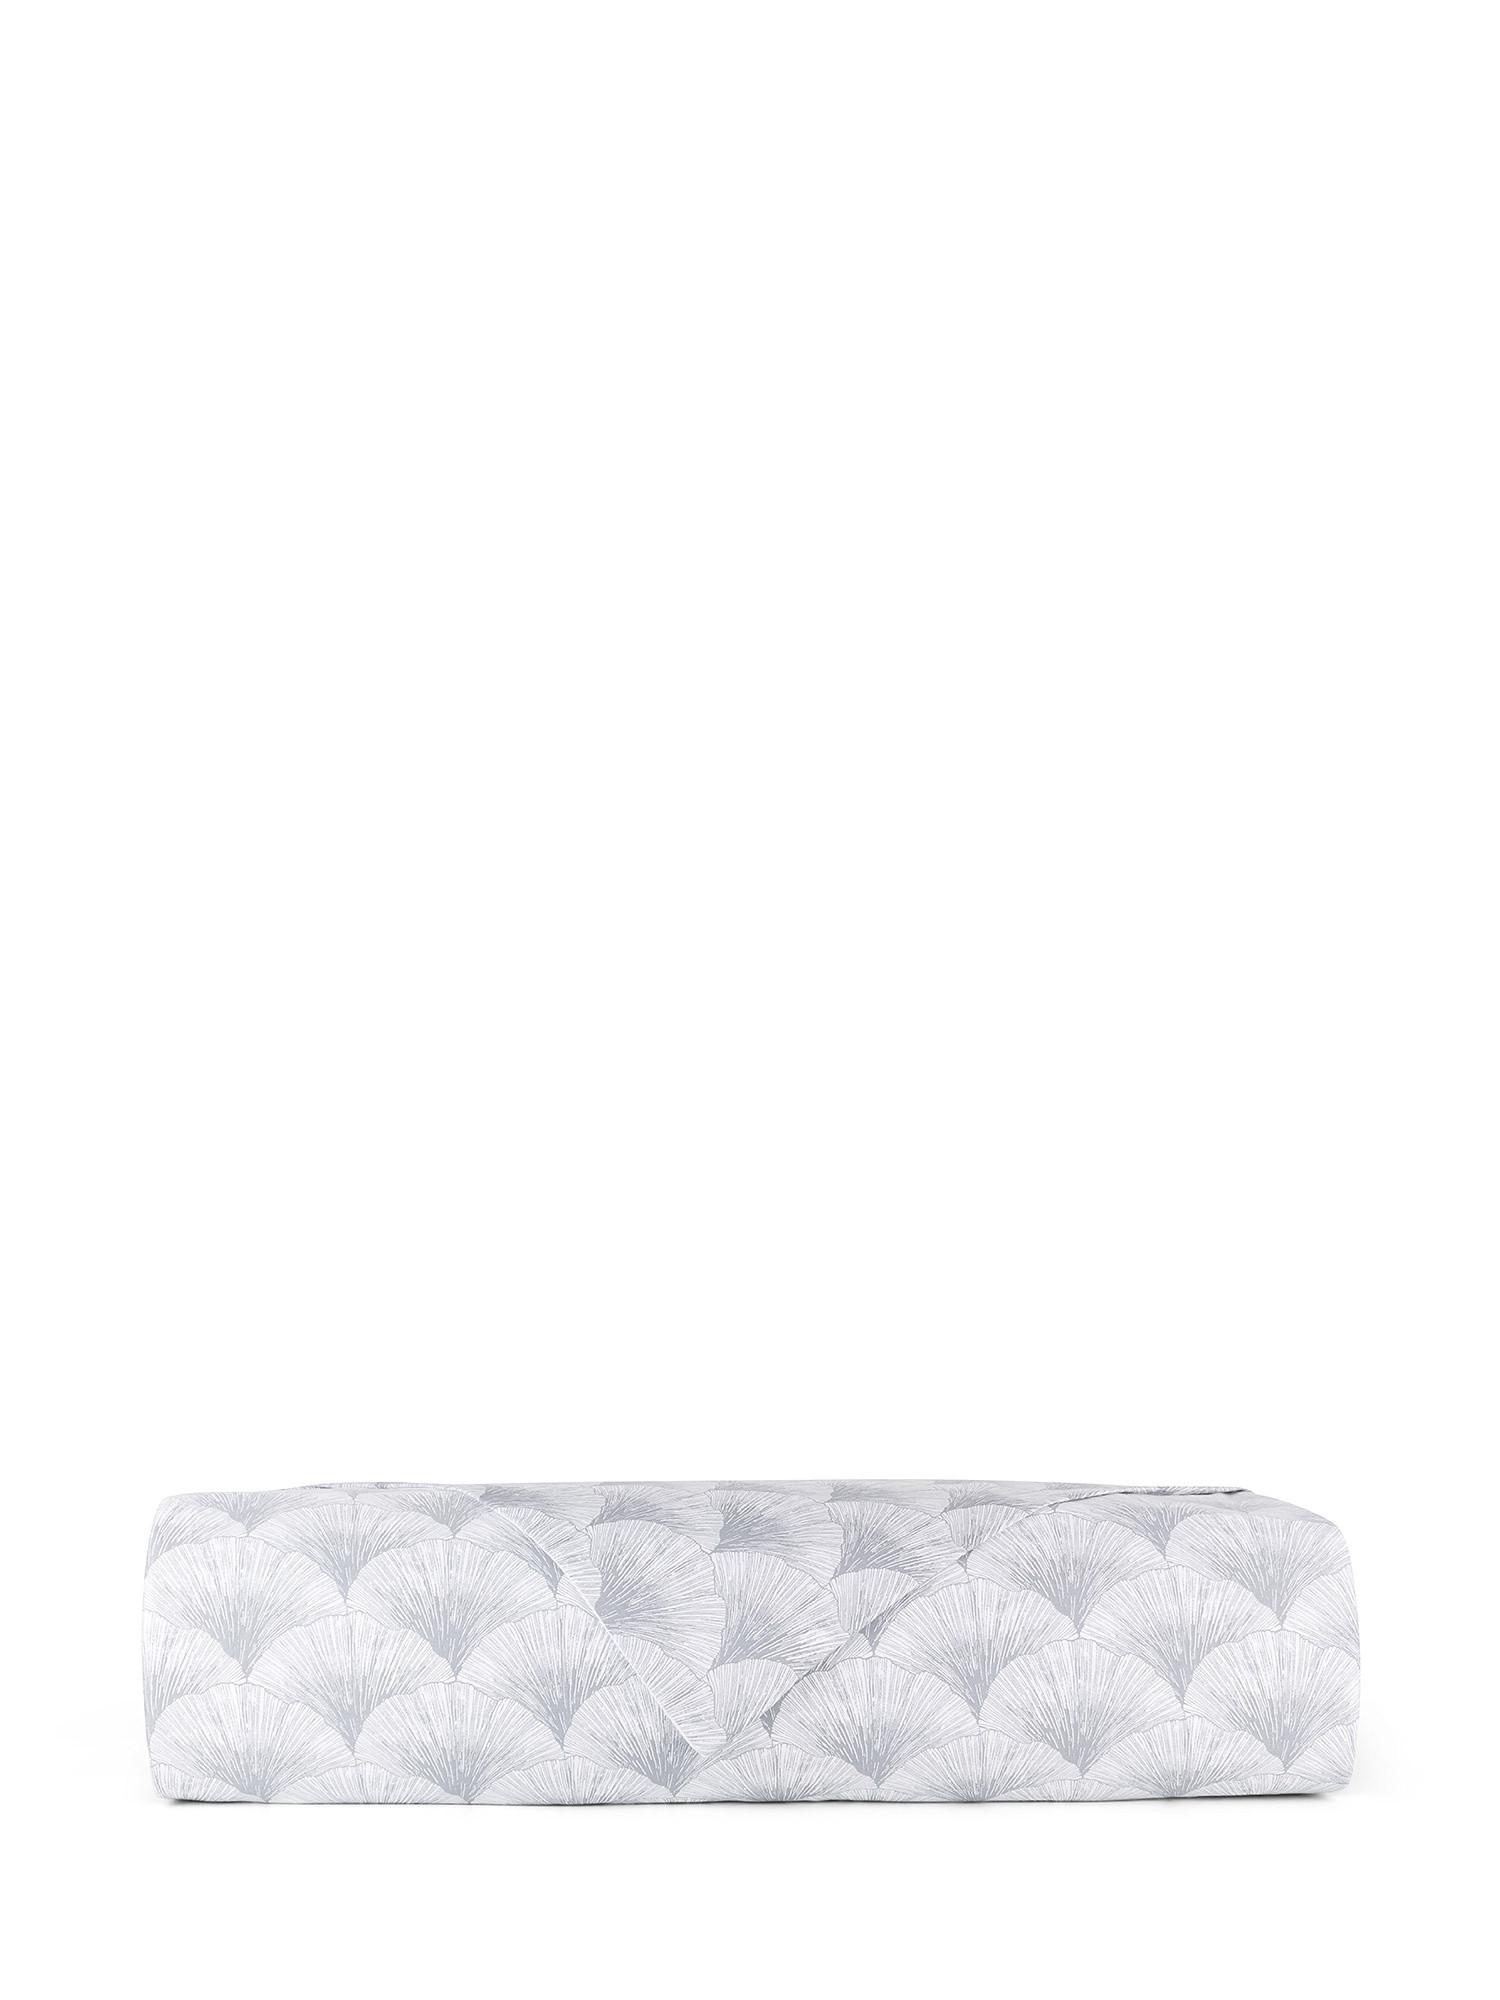 Copripiumino raso di cotone fantasia Ginkgo, Bianco, large image number 1